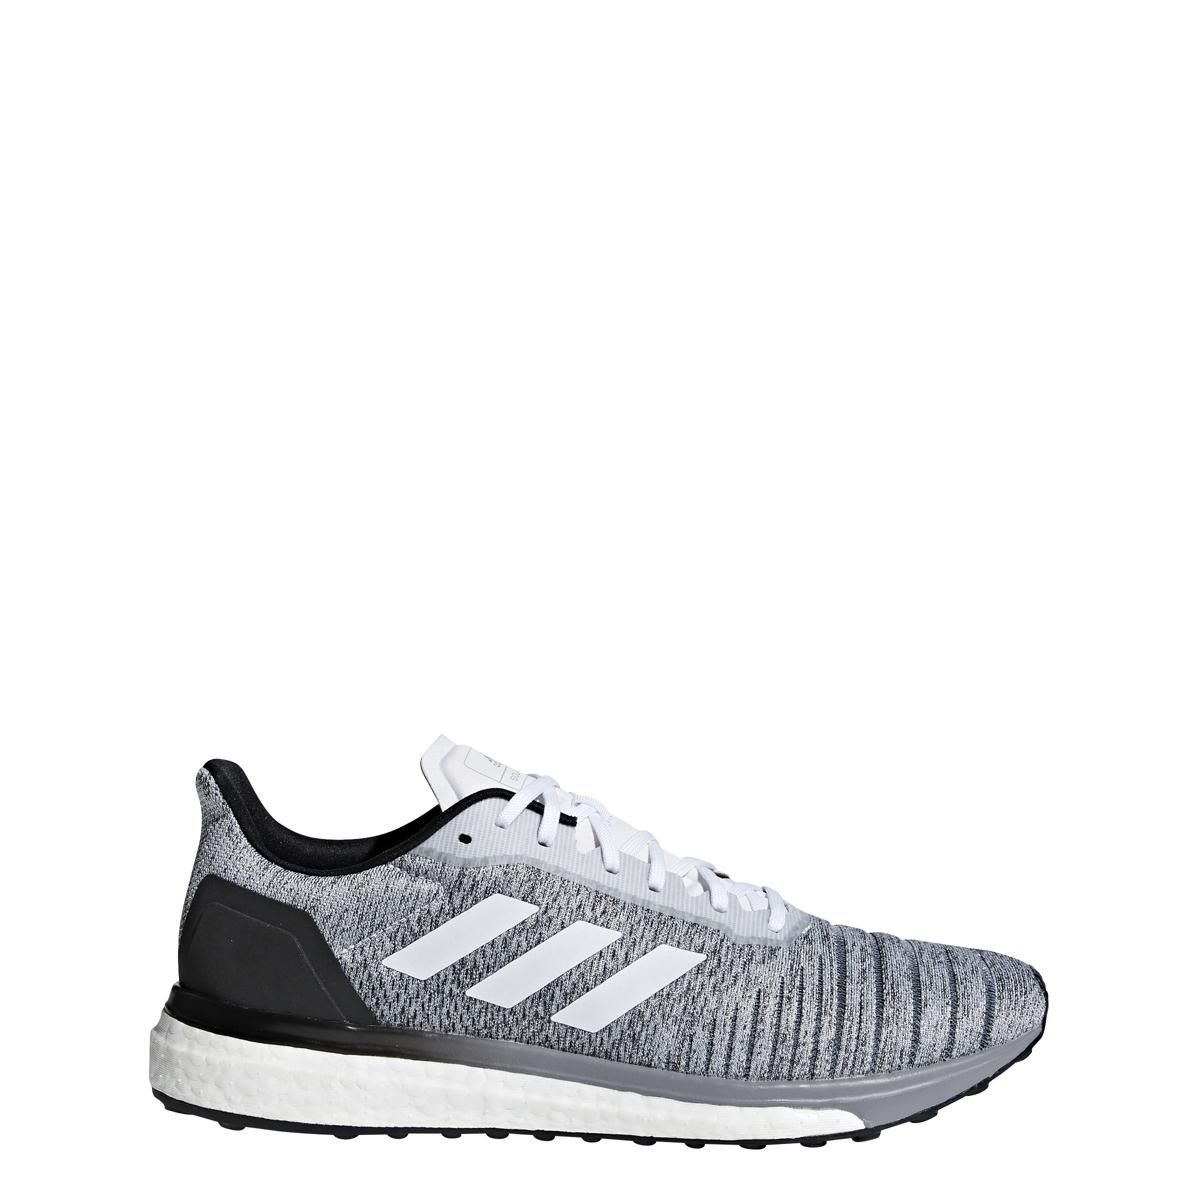 379d920b2acb97 Details about Men s Adidas Solar Drive M Running Shoe White Black